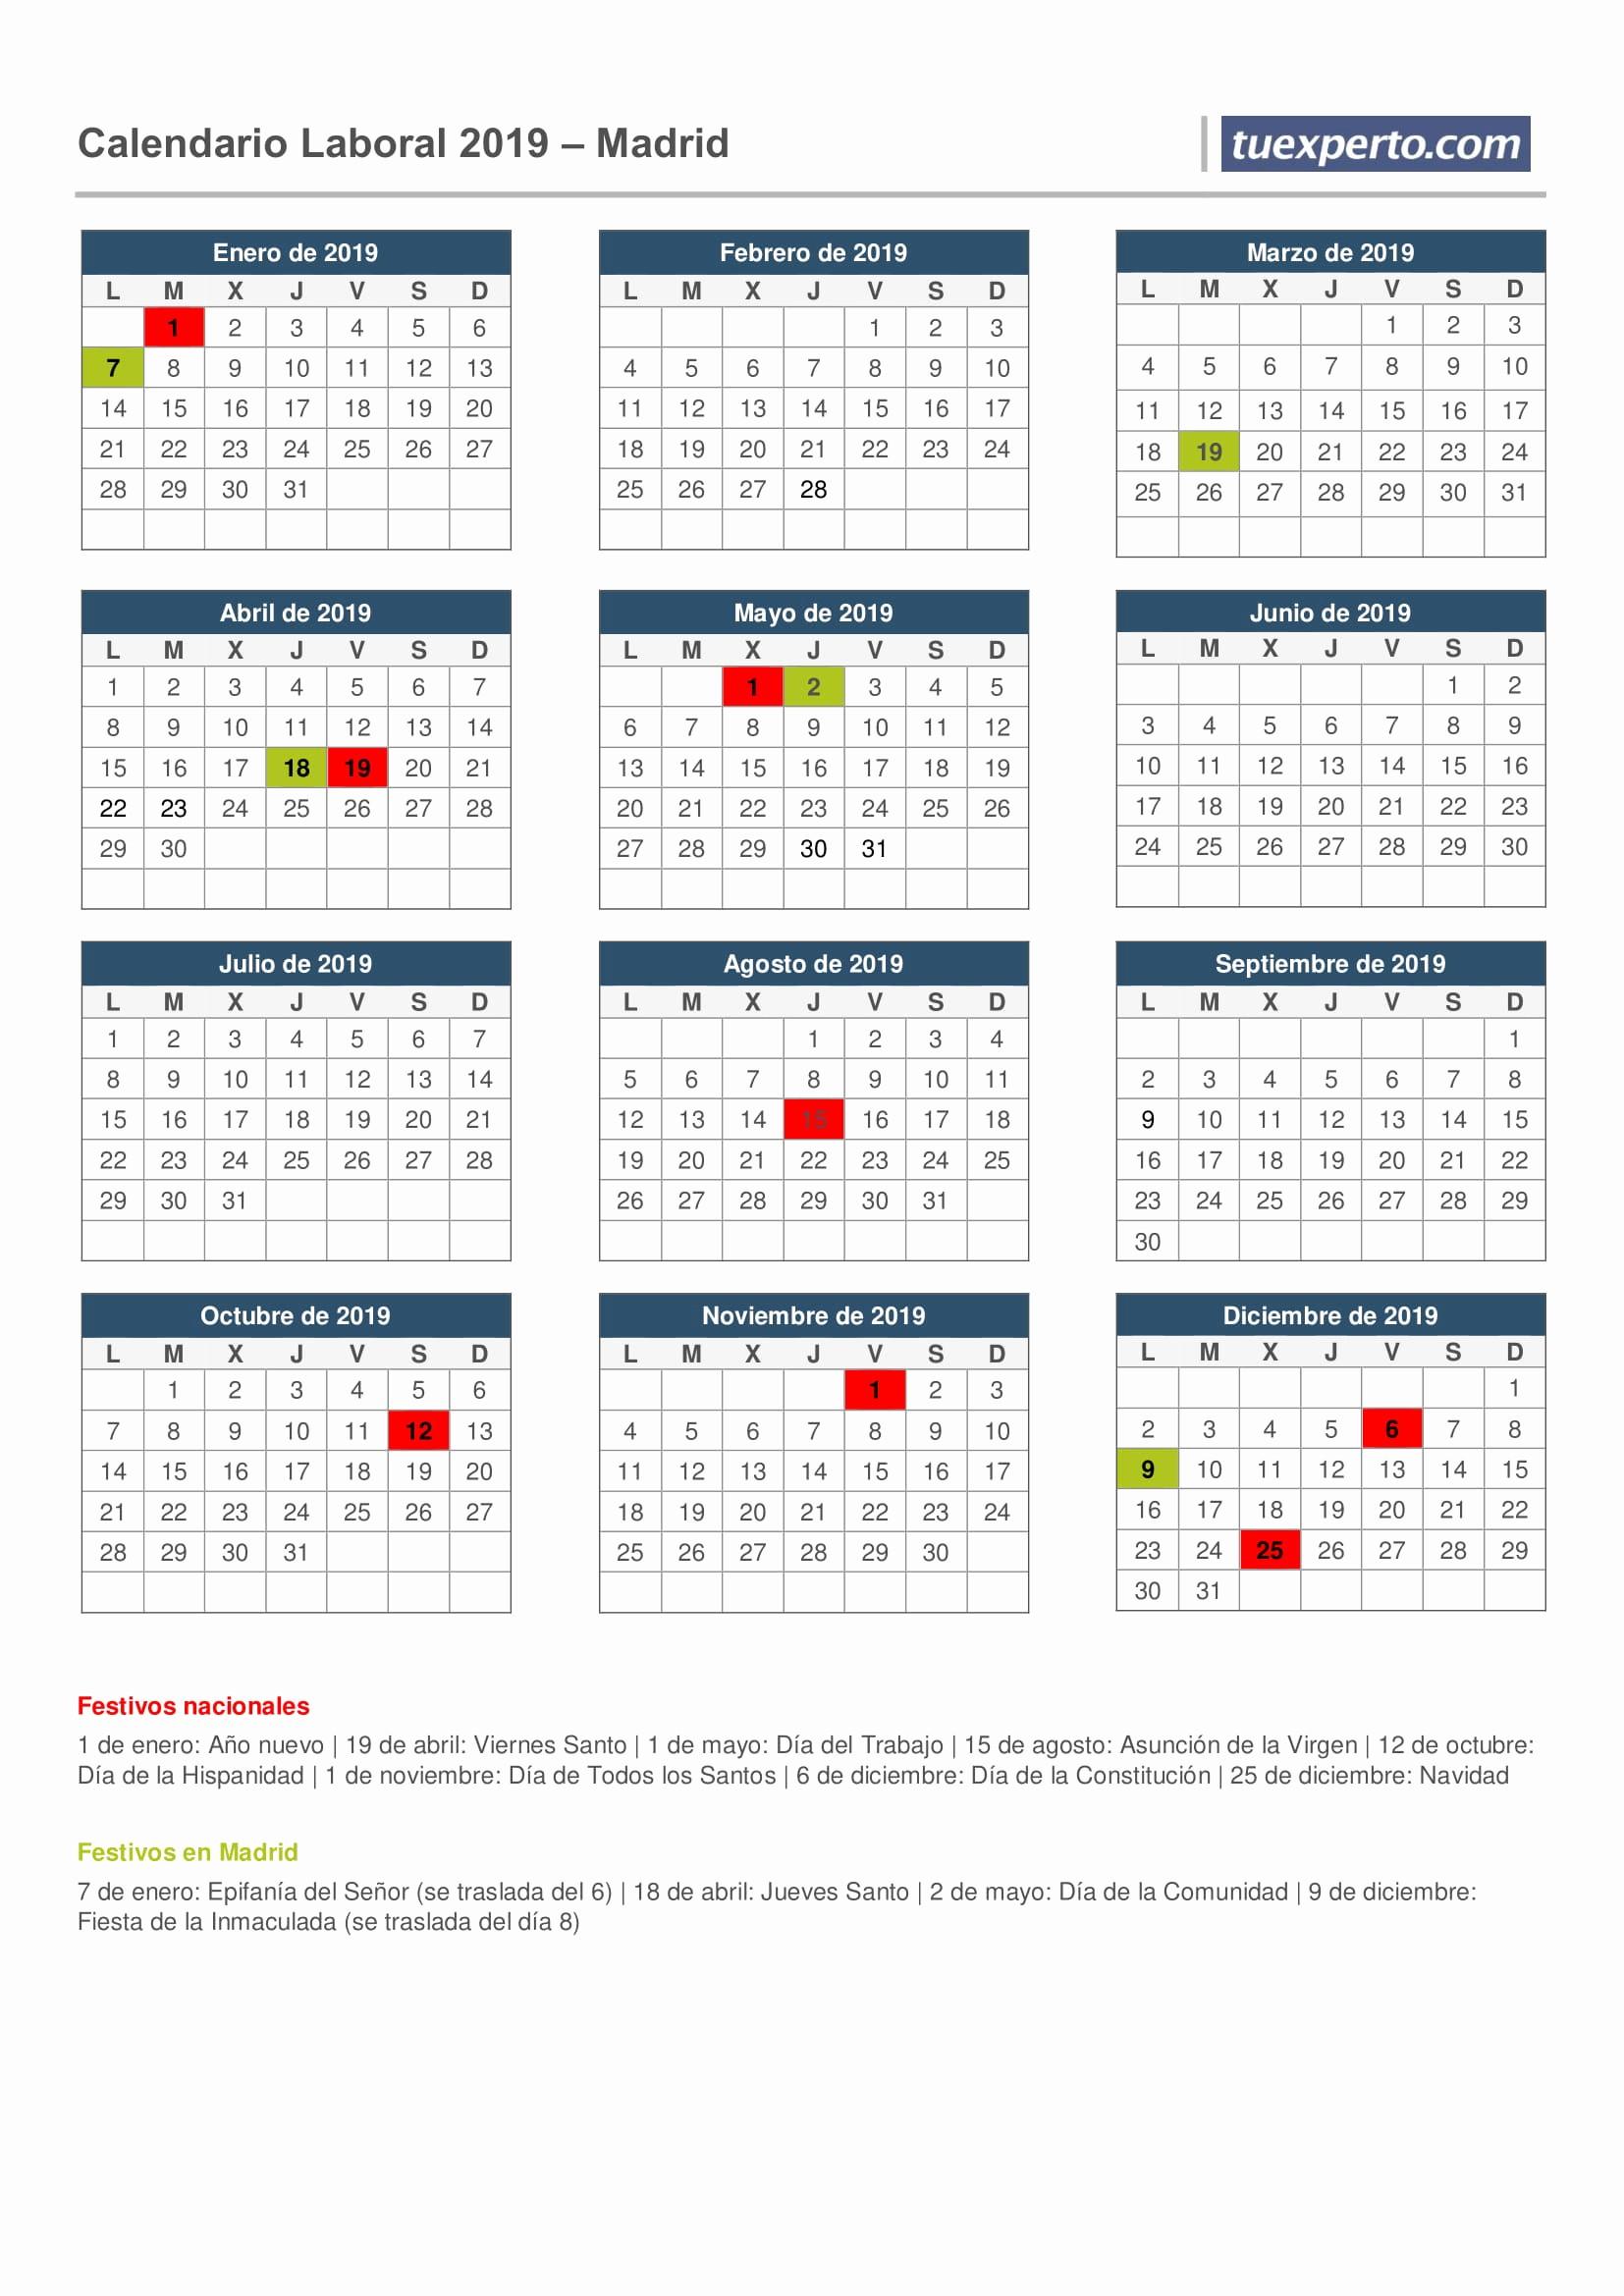 calendario laboral 218 2019 calendario laboral 218 2019 calendario laboral 2019 calendarios con festivos por 1